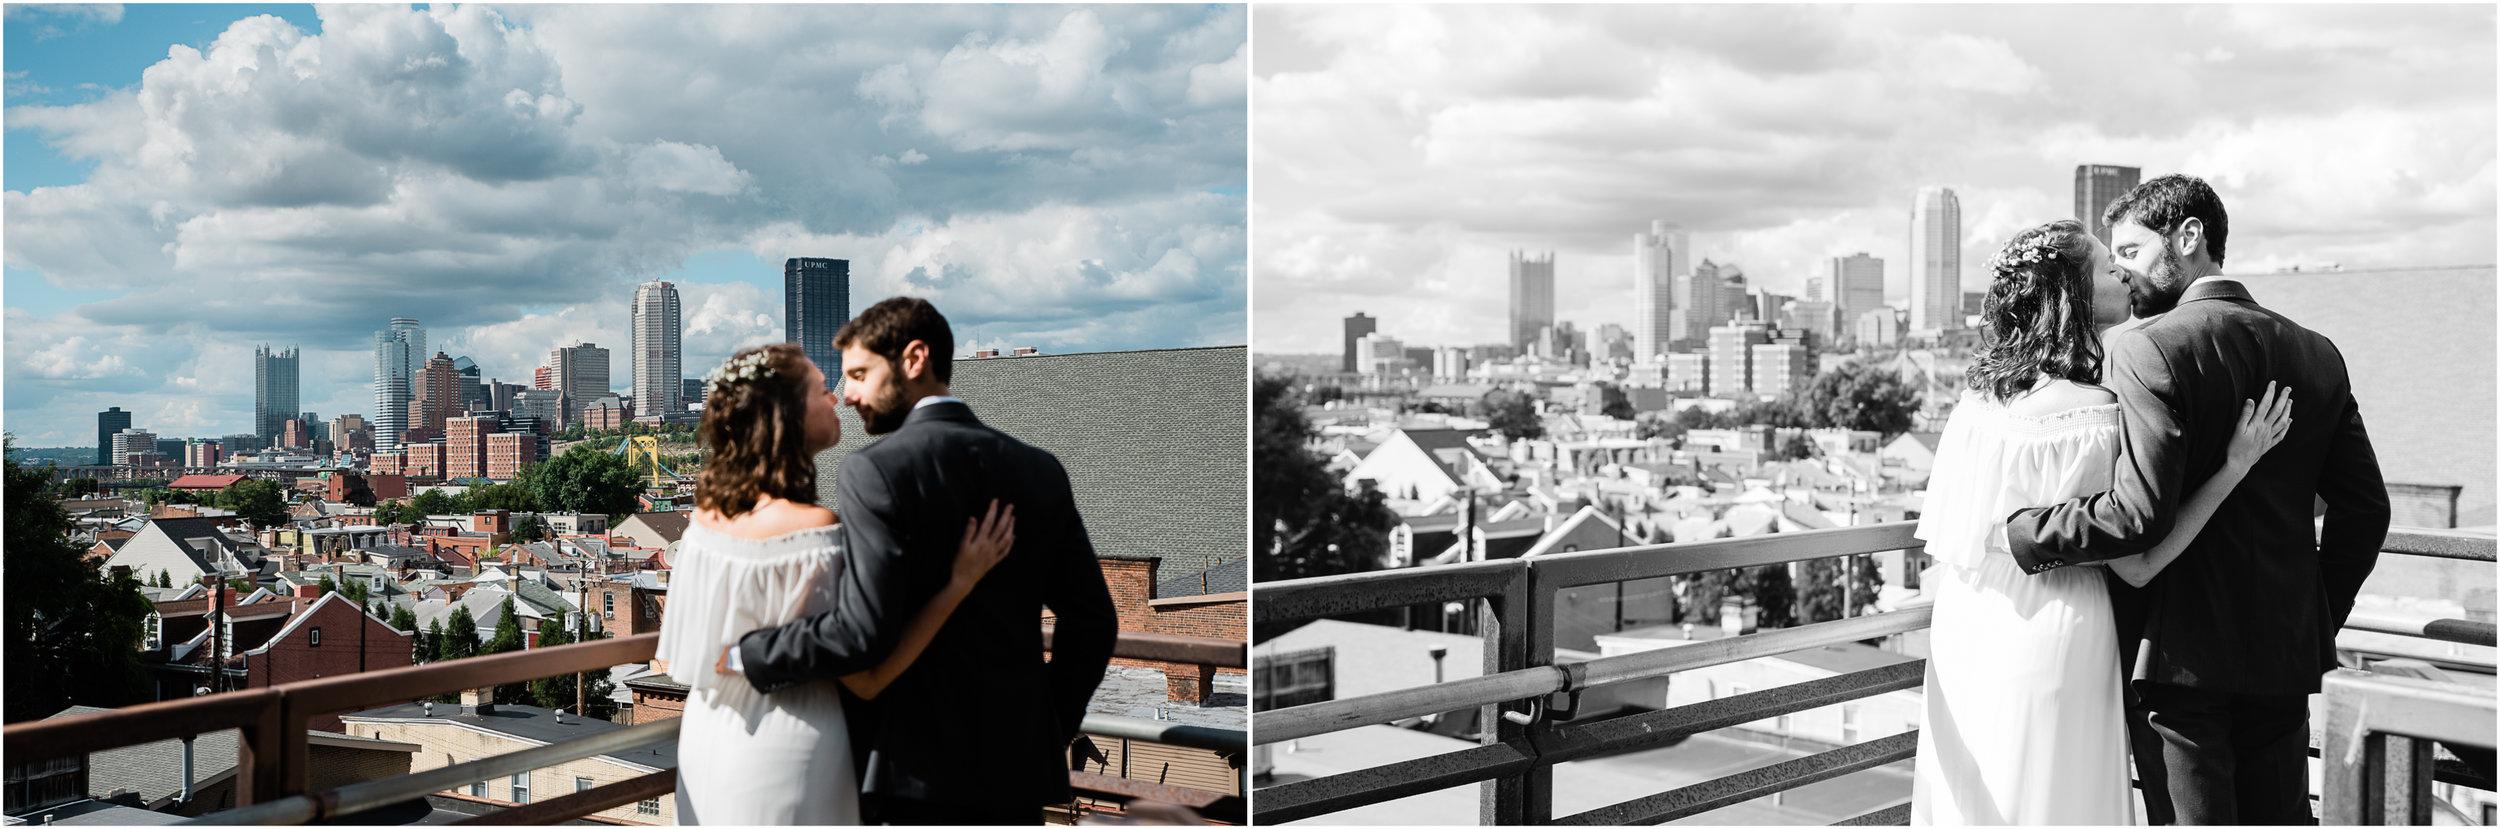 Pittsburgh skyline, Pittsburgh wedding photographer, wedding photography.jpg